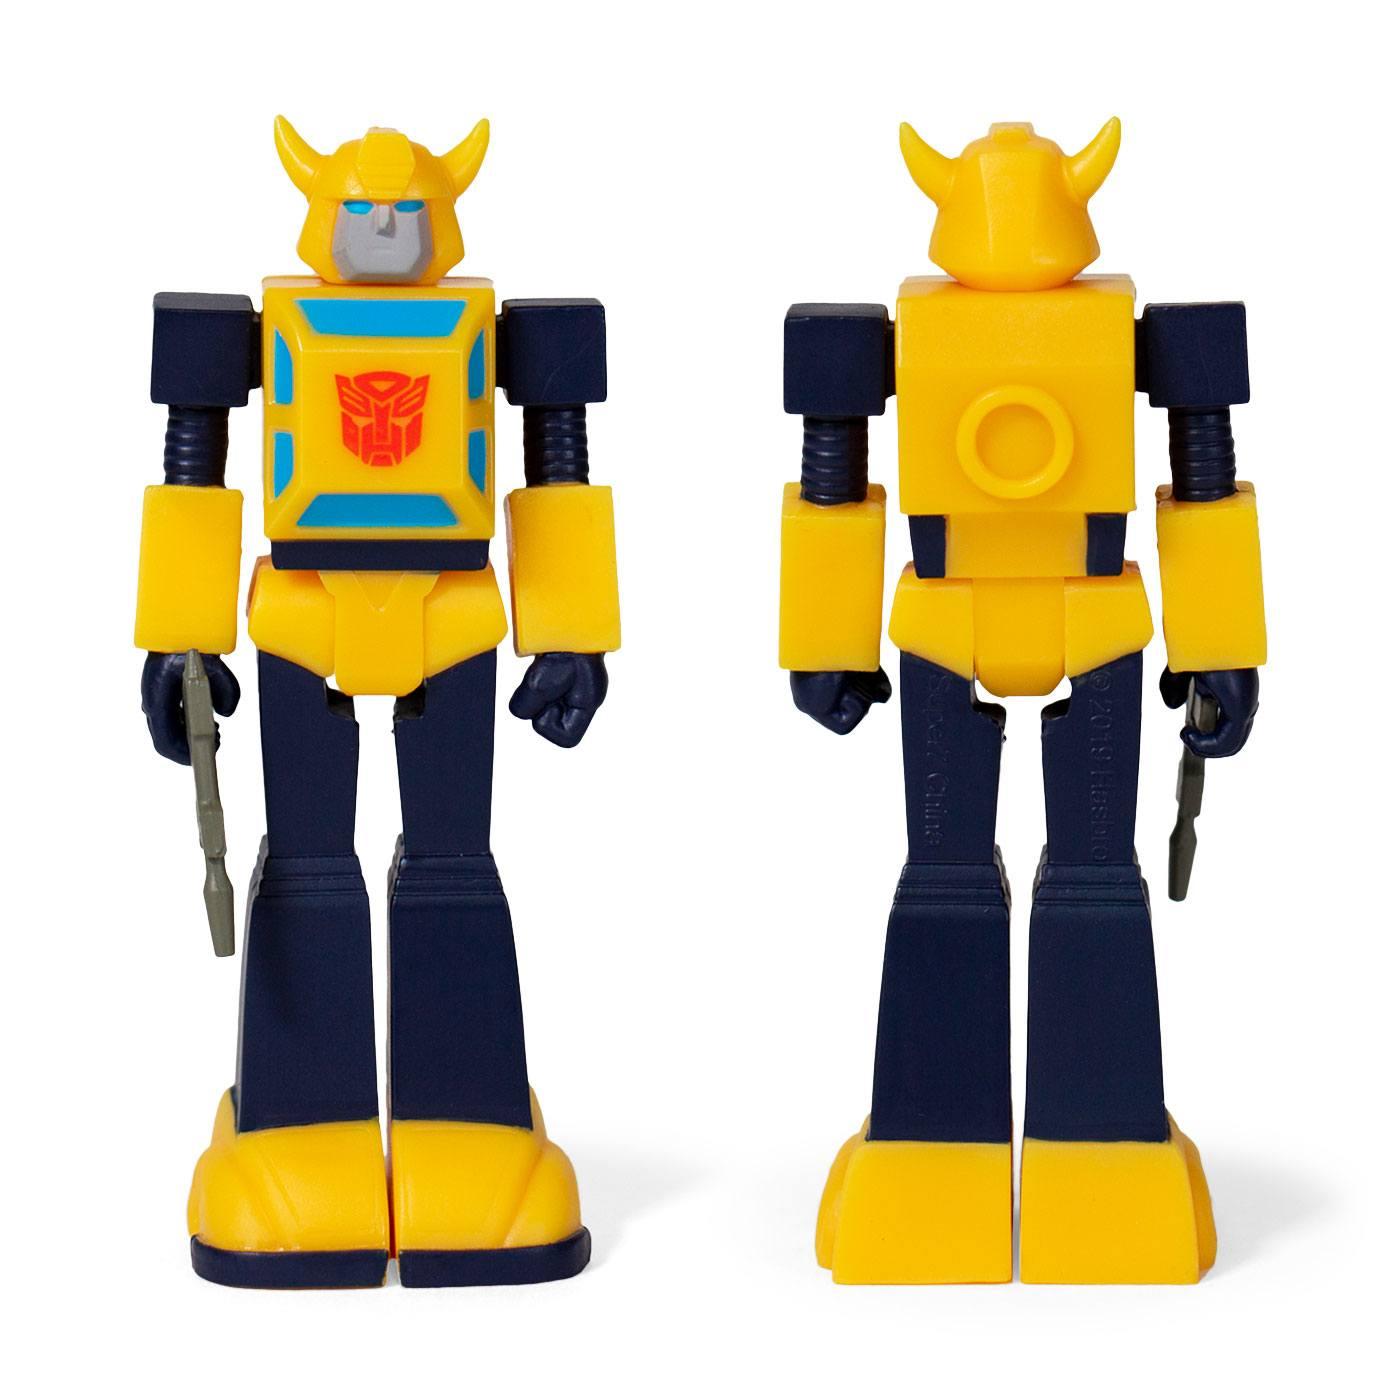 Transformers ReAction Action Figure Wave 1 Bumblebee 10 cm